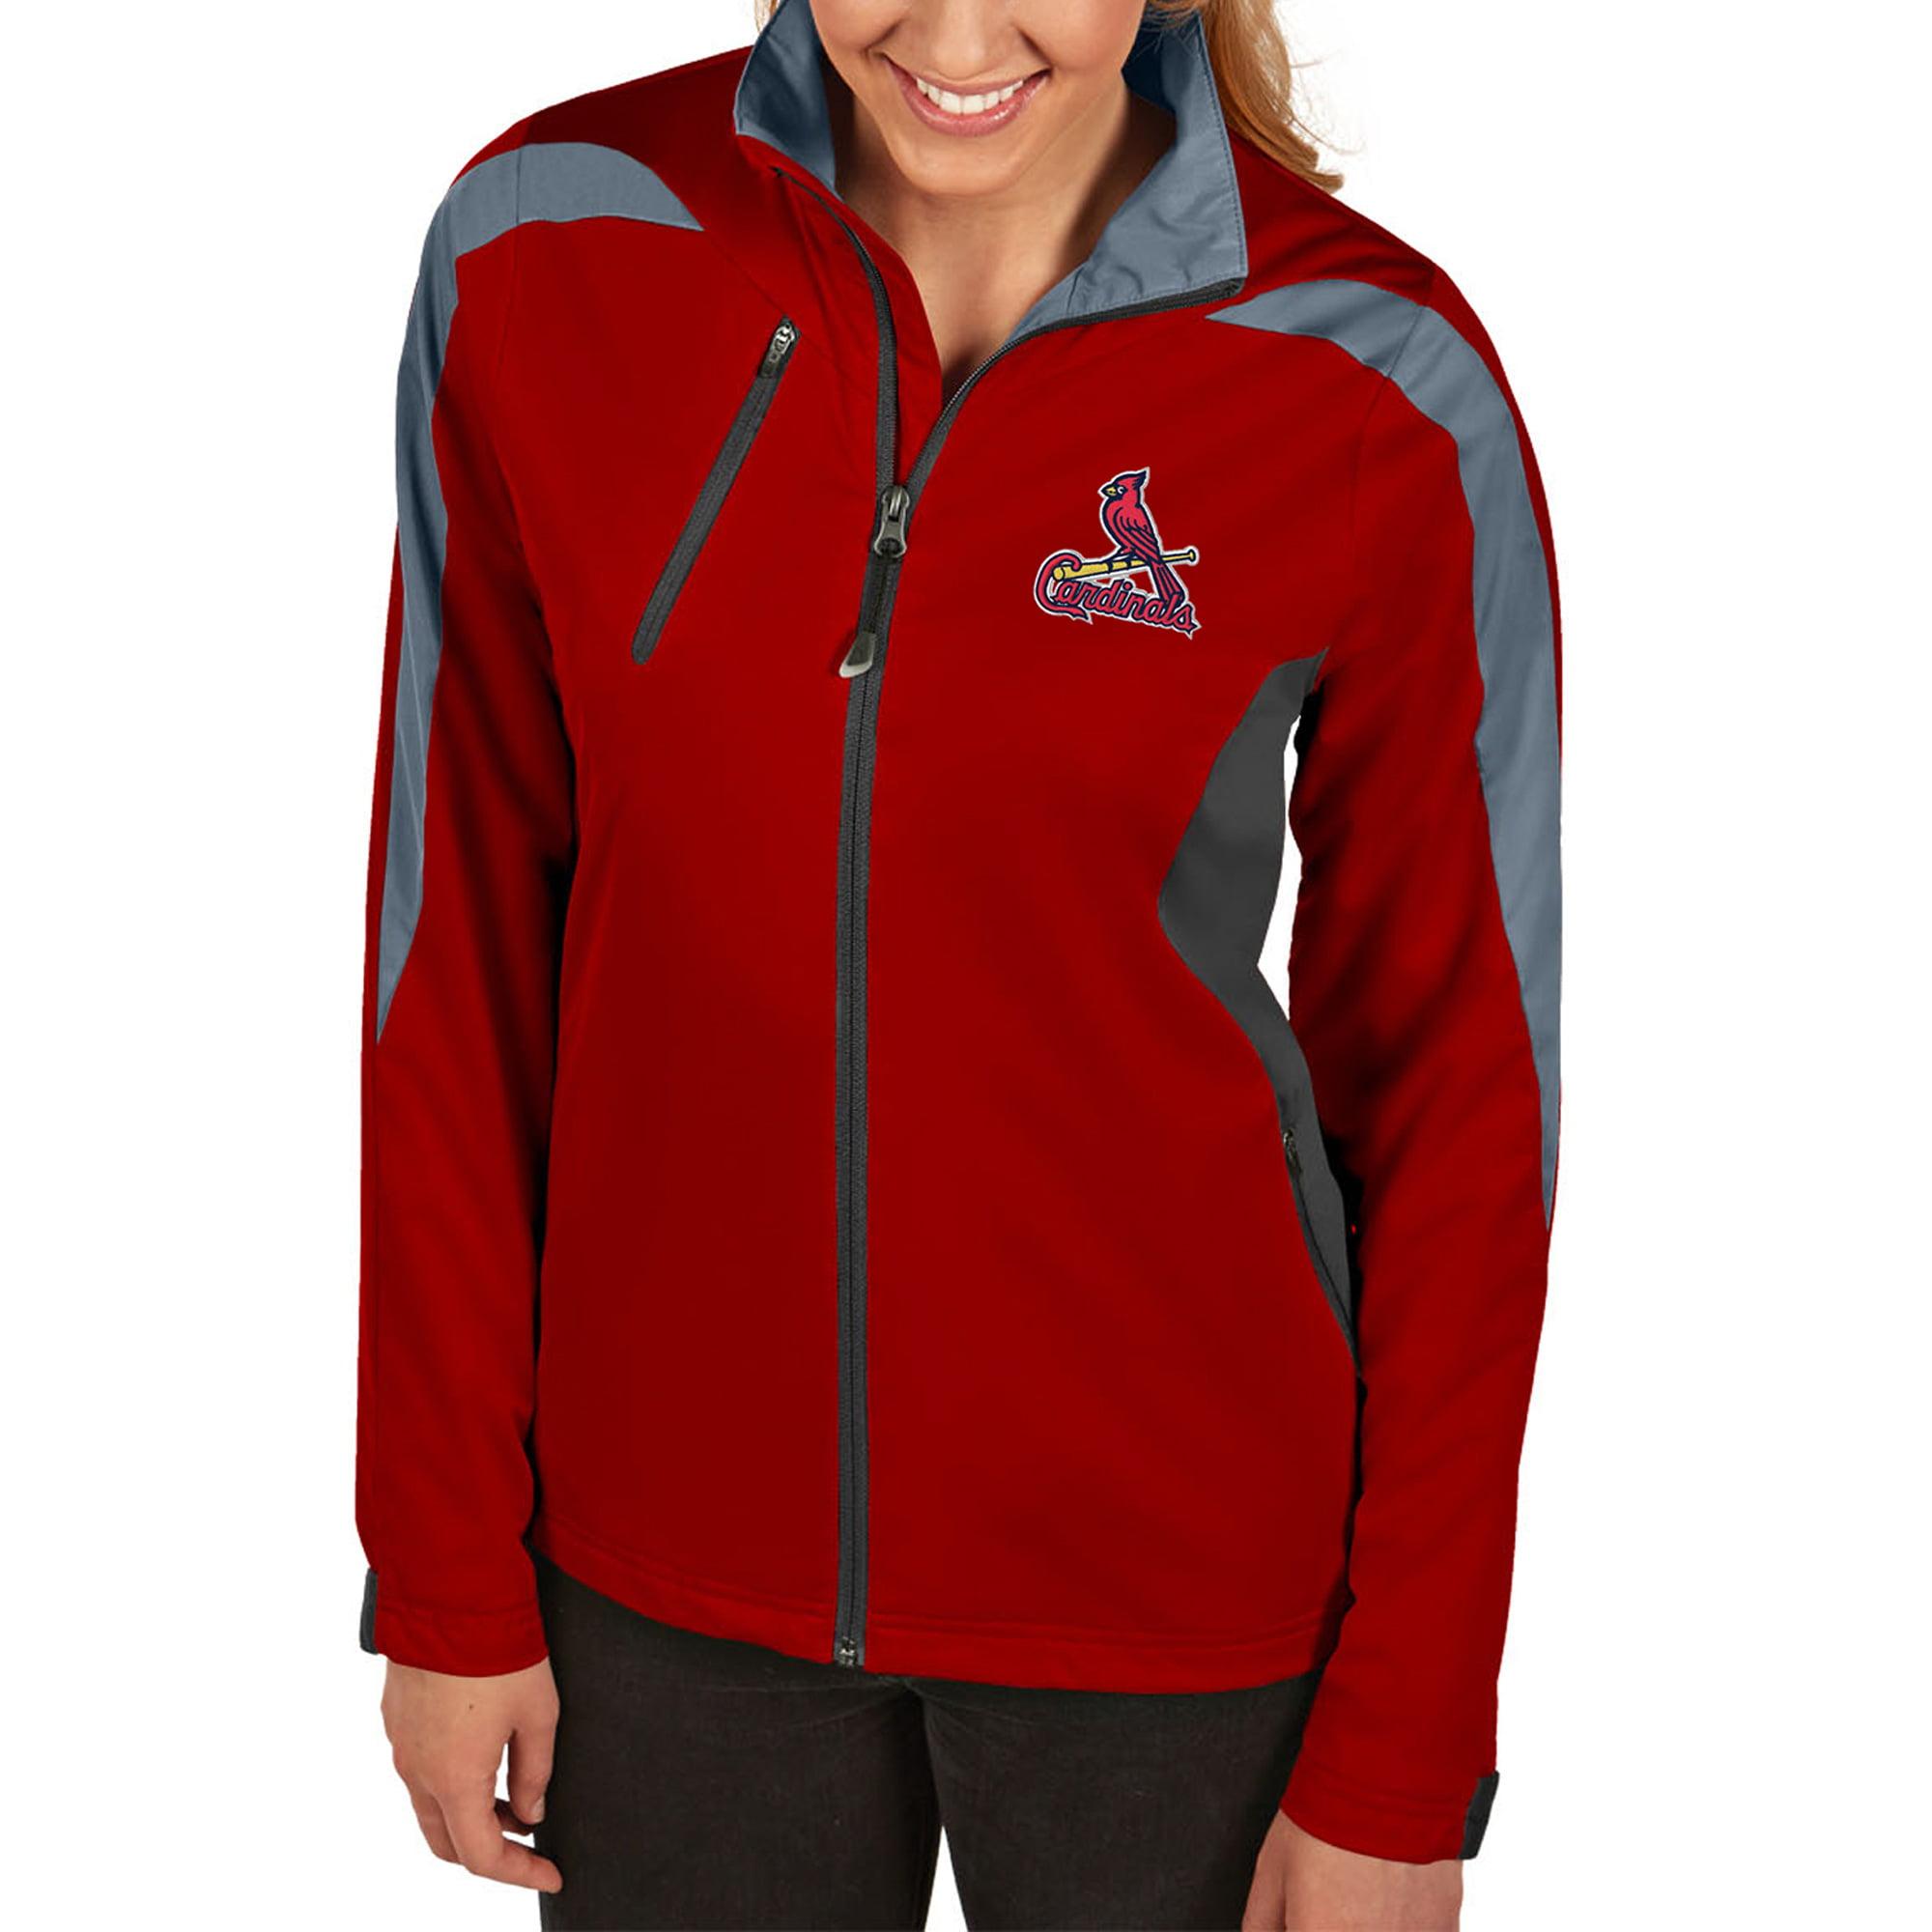 St. Louis Cardinals Antigua Women's Discover Full-Zip Jacket - Red